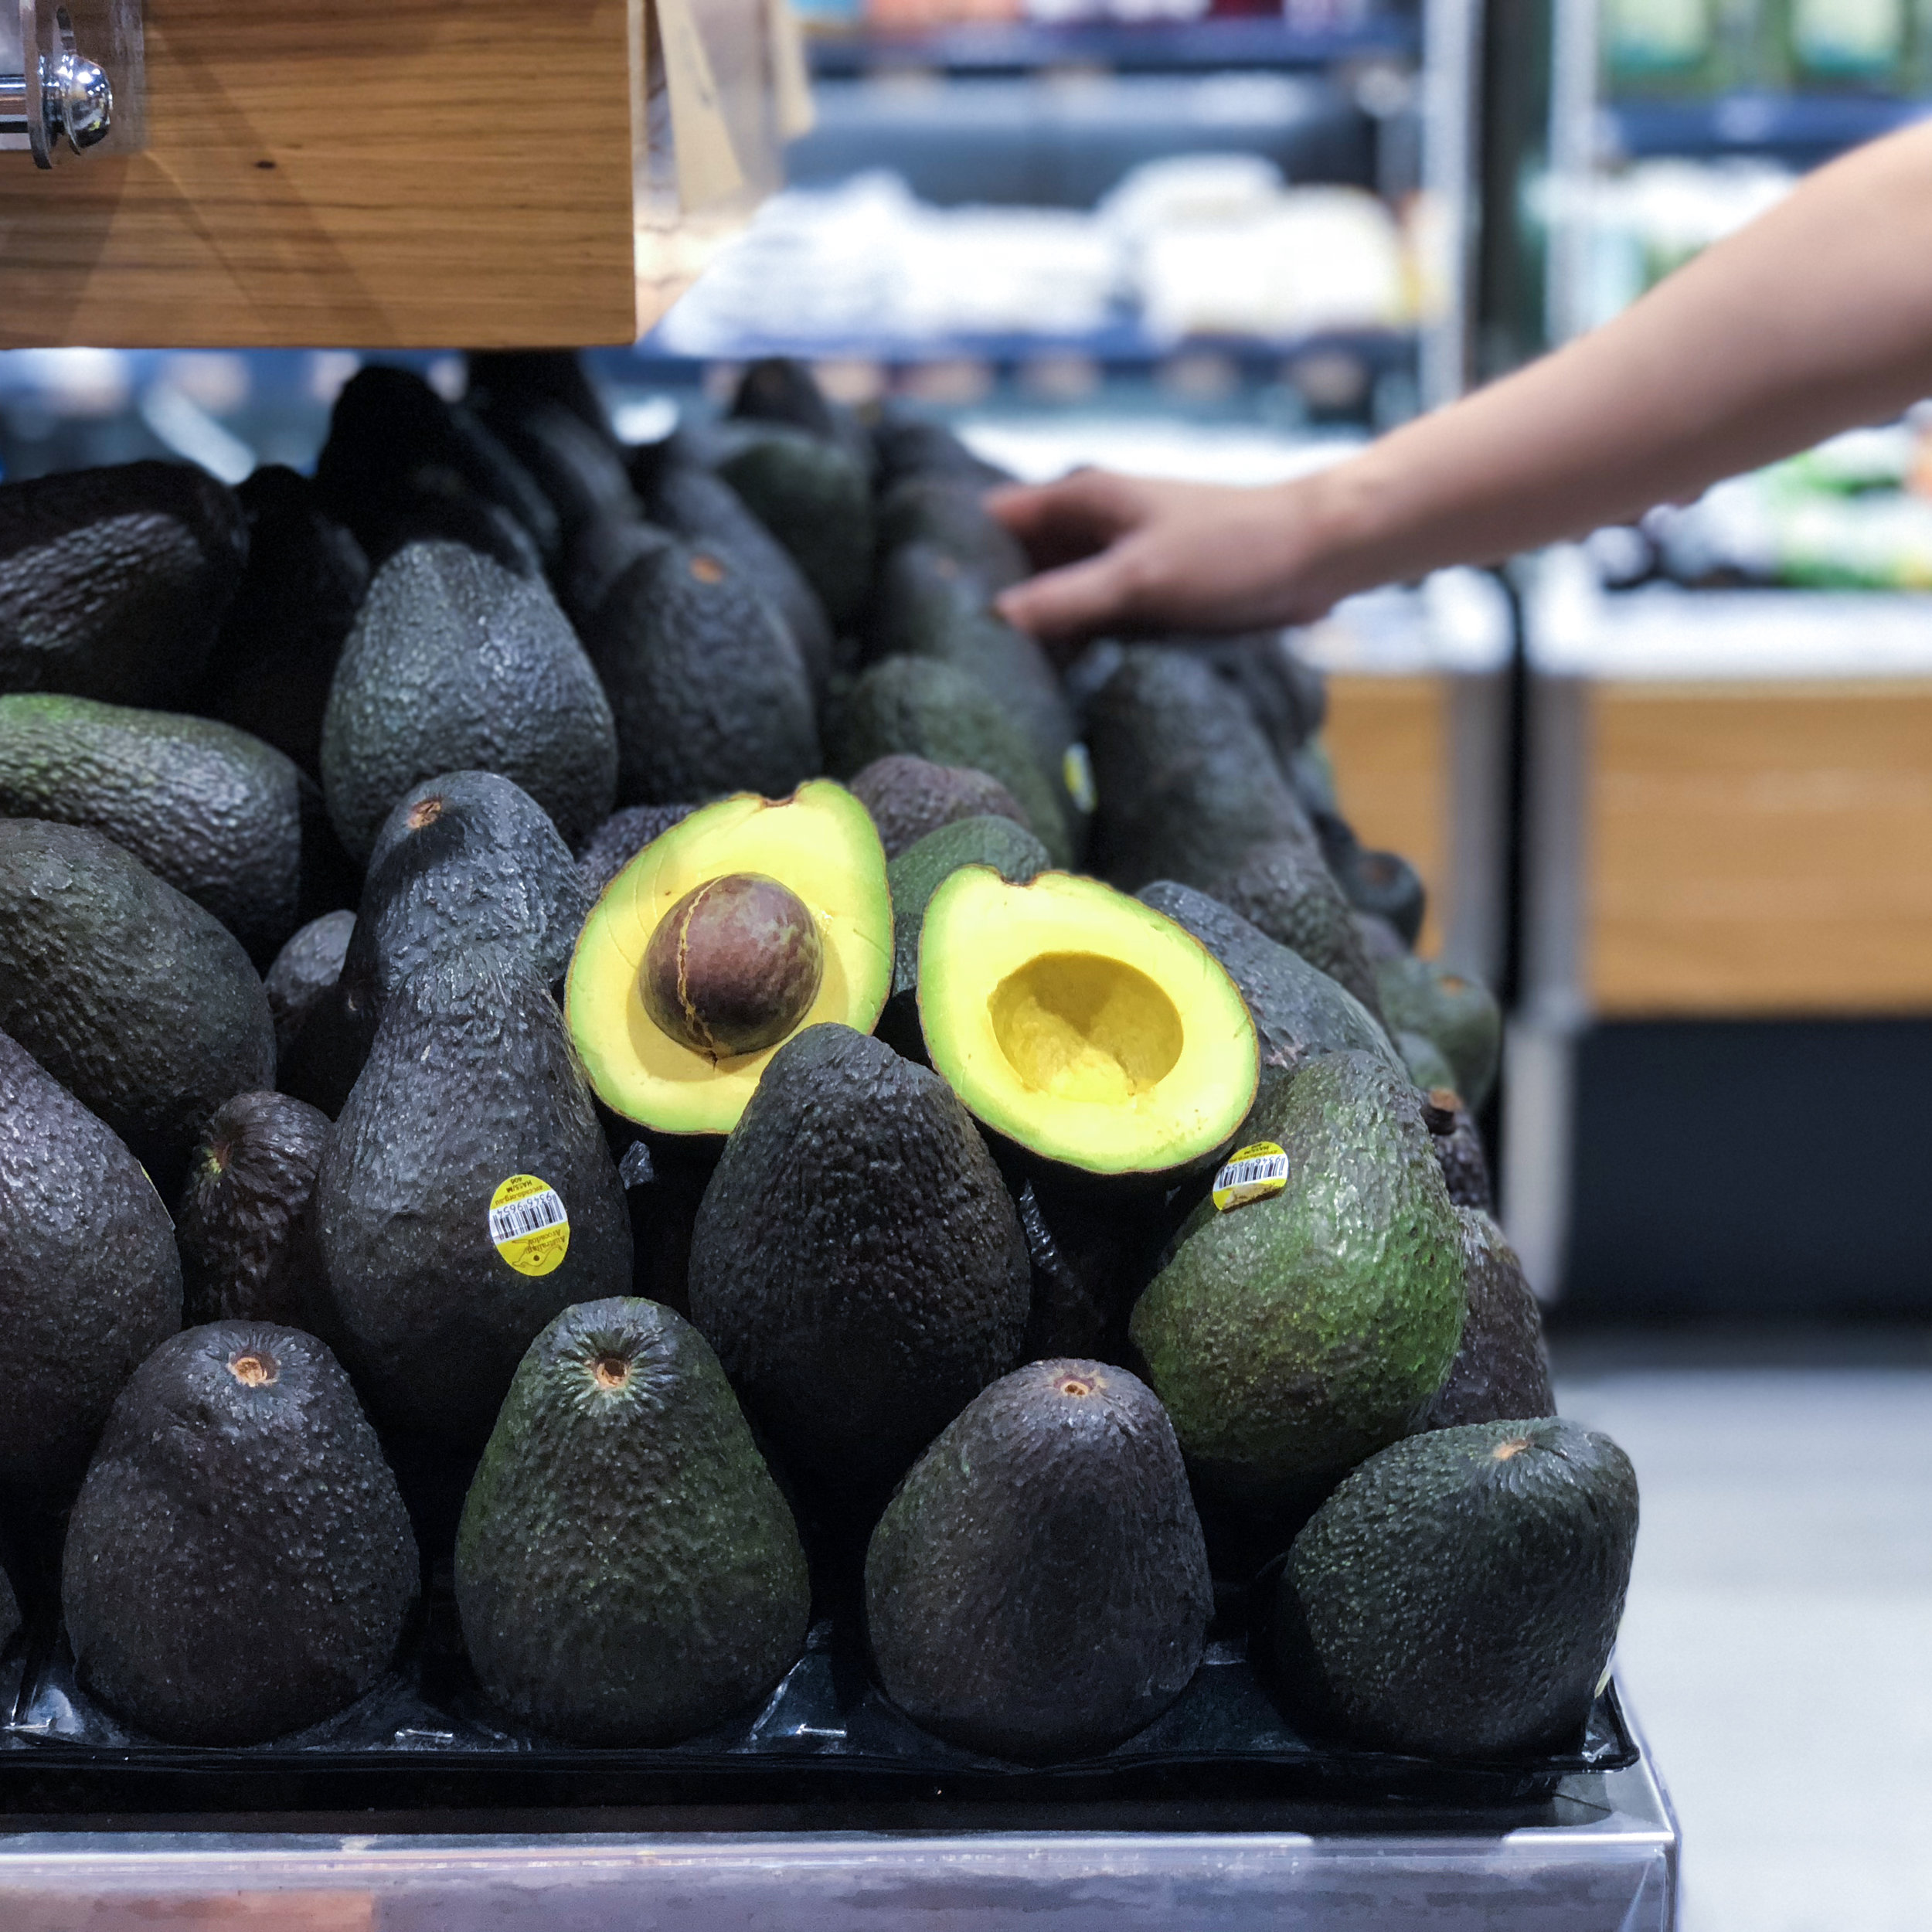 little farms hass avocado singapore health coach.jpg